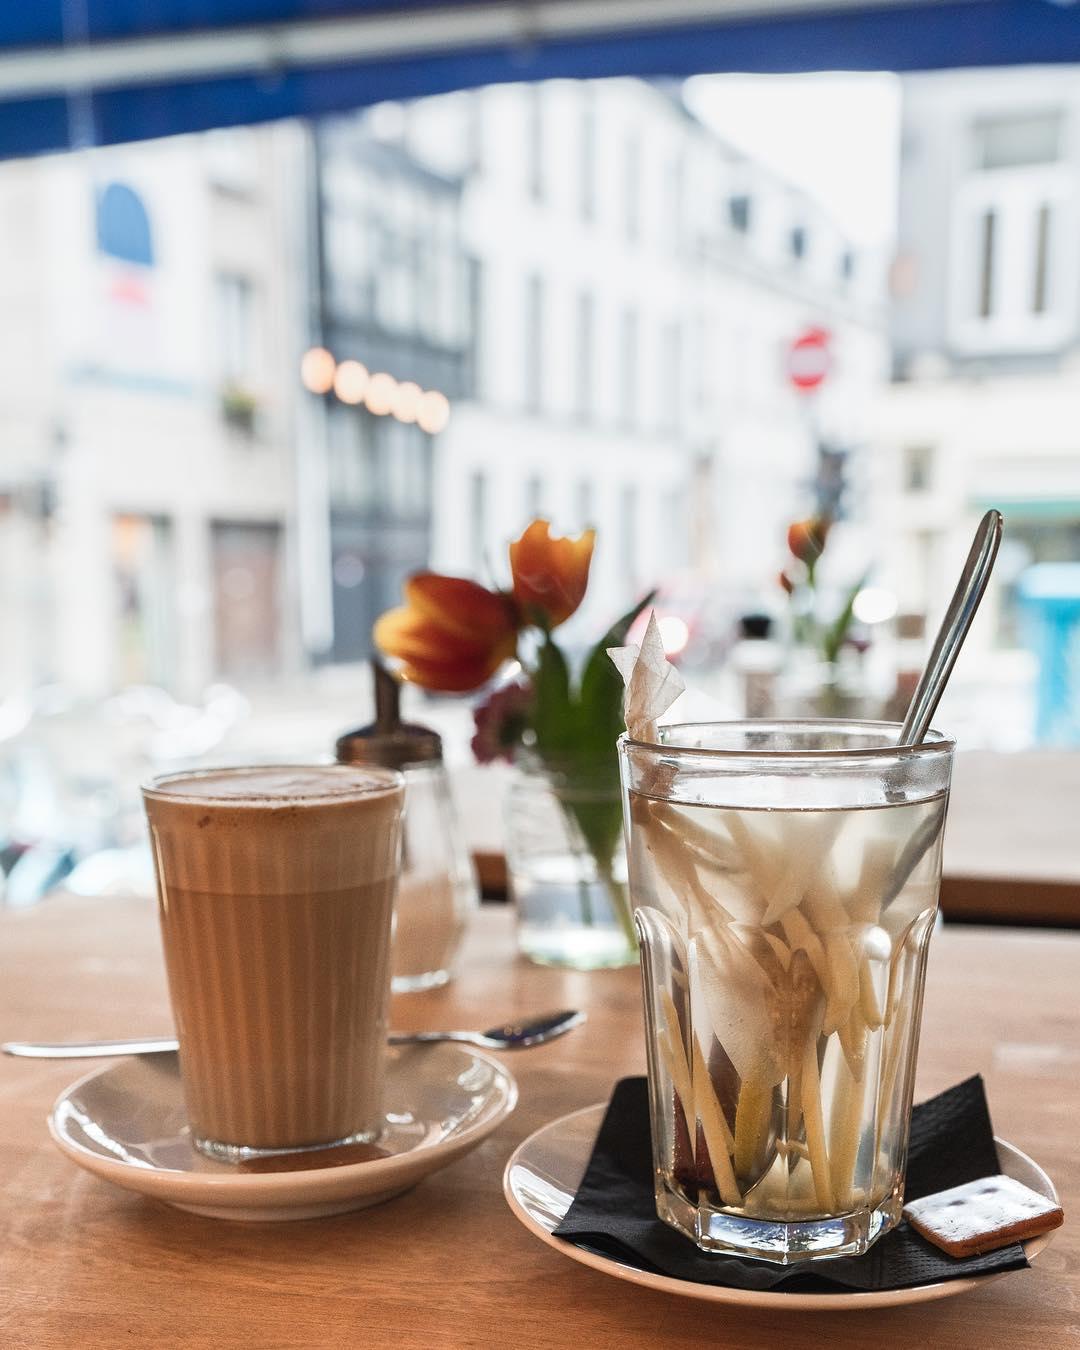 laboitedallumettes-anvers-travel-trip-citytrip-momu-mas-stroom-wasbar-laverie-tartines-déjeuner-petitdéjeuner-diner-experience-belgium-map-port-bar-restaurant